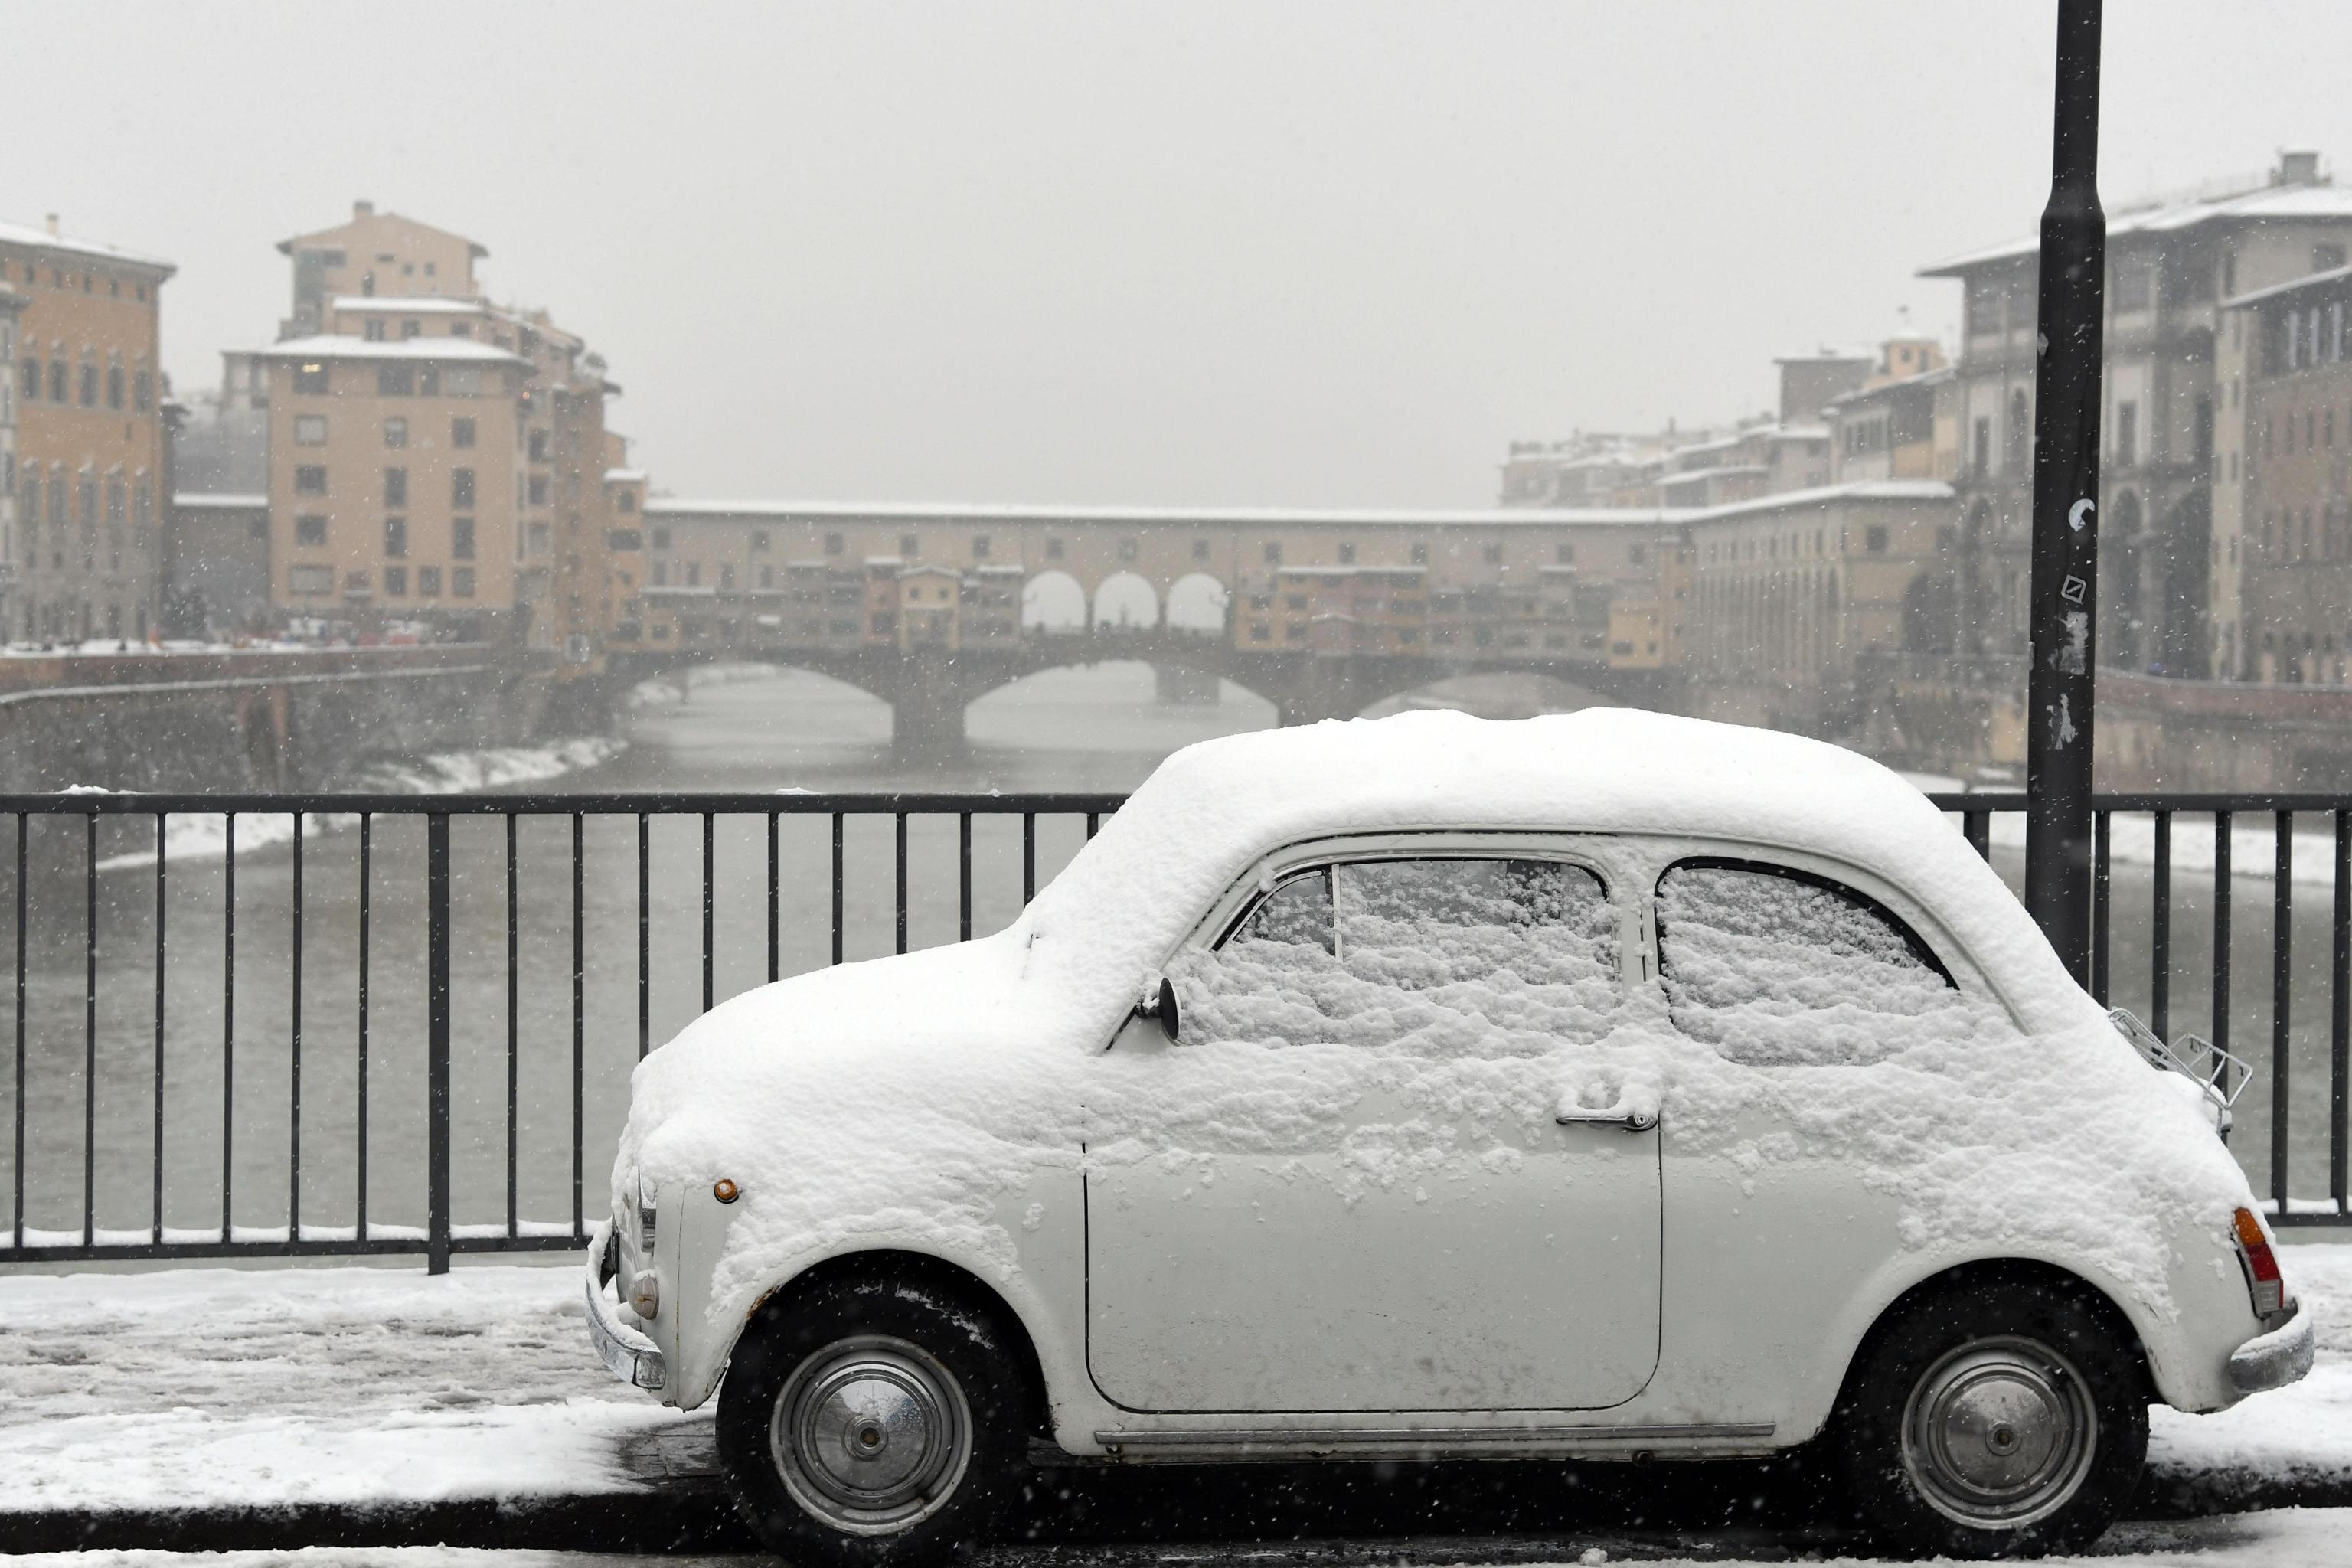 Maltempo: allerta neve Toscana, chiuse scuole a Firenze